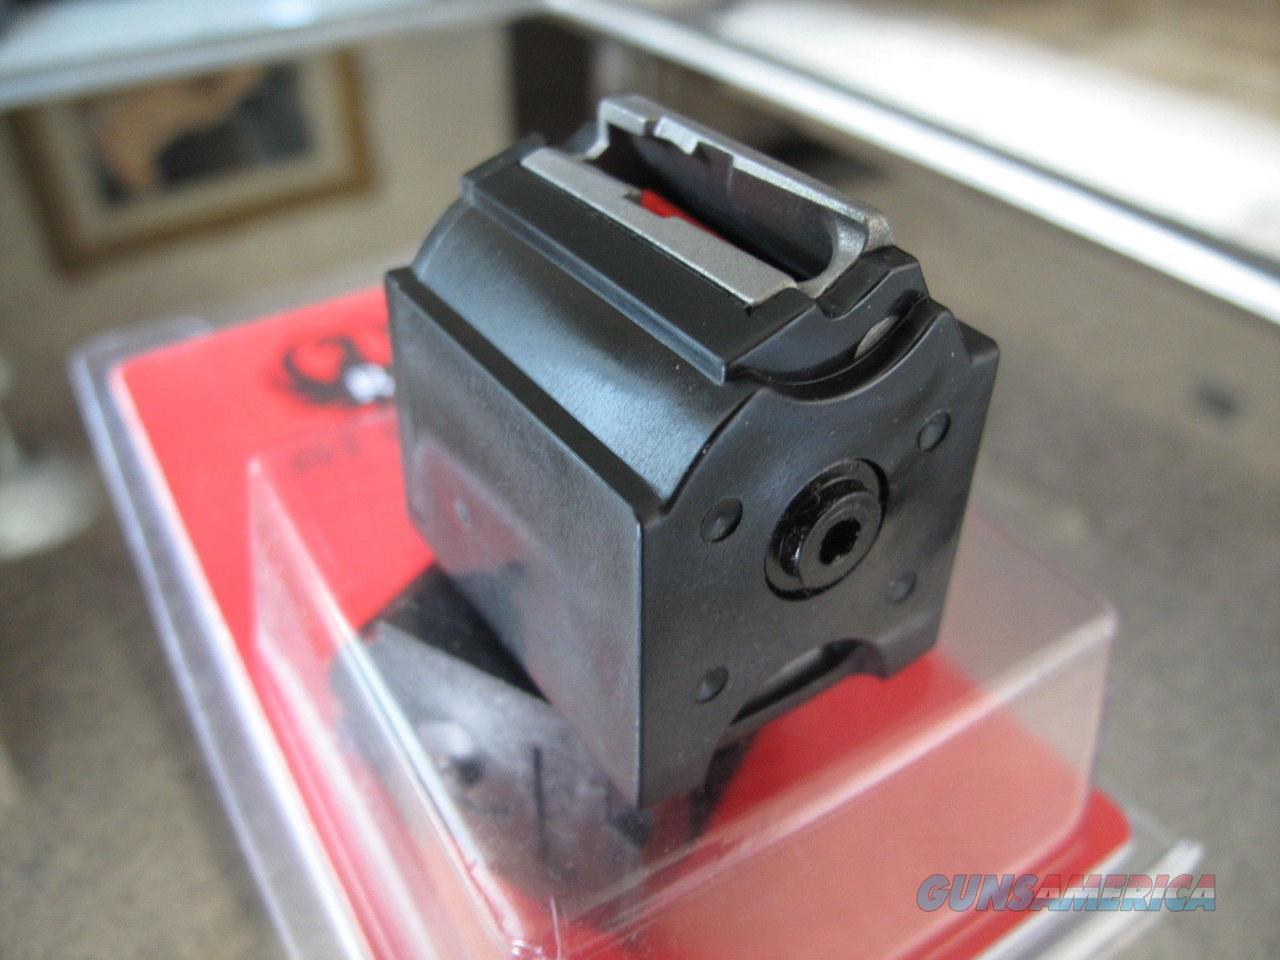 2-Pack Ruger 10/22 10 22 Mag Black Magazine Magazines 22lr 10 round .22lr Mags  Non-Guns > Ammunition